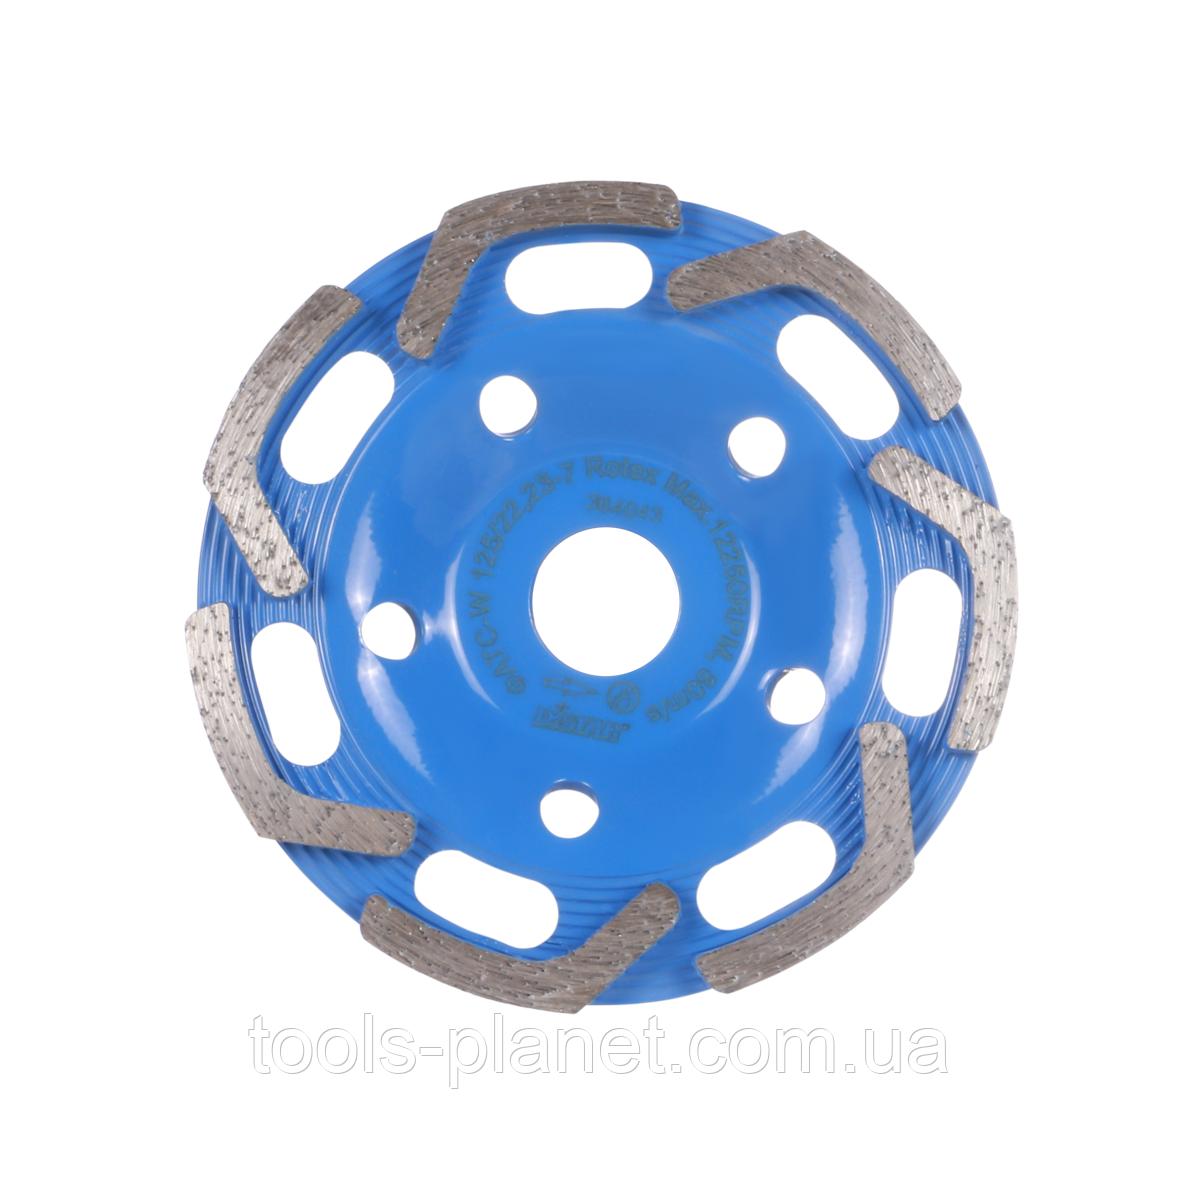 Алмазная чашка (фреза) по бетону Distar ФАТС-W 125 x 22,23 Rotex (16915067010)